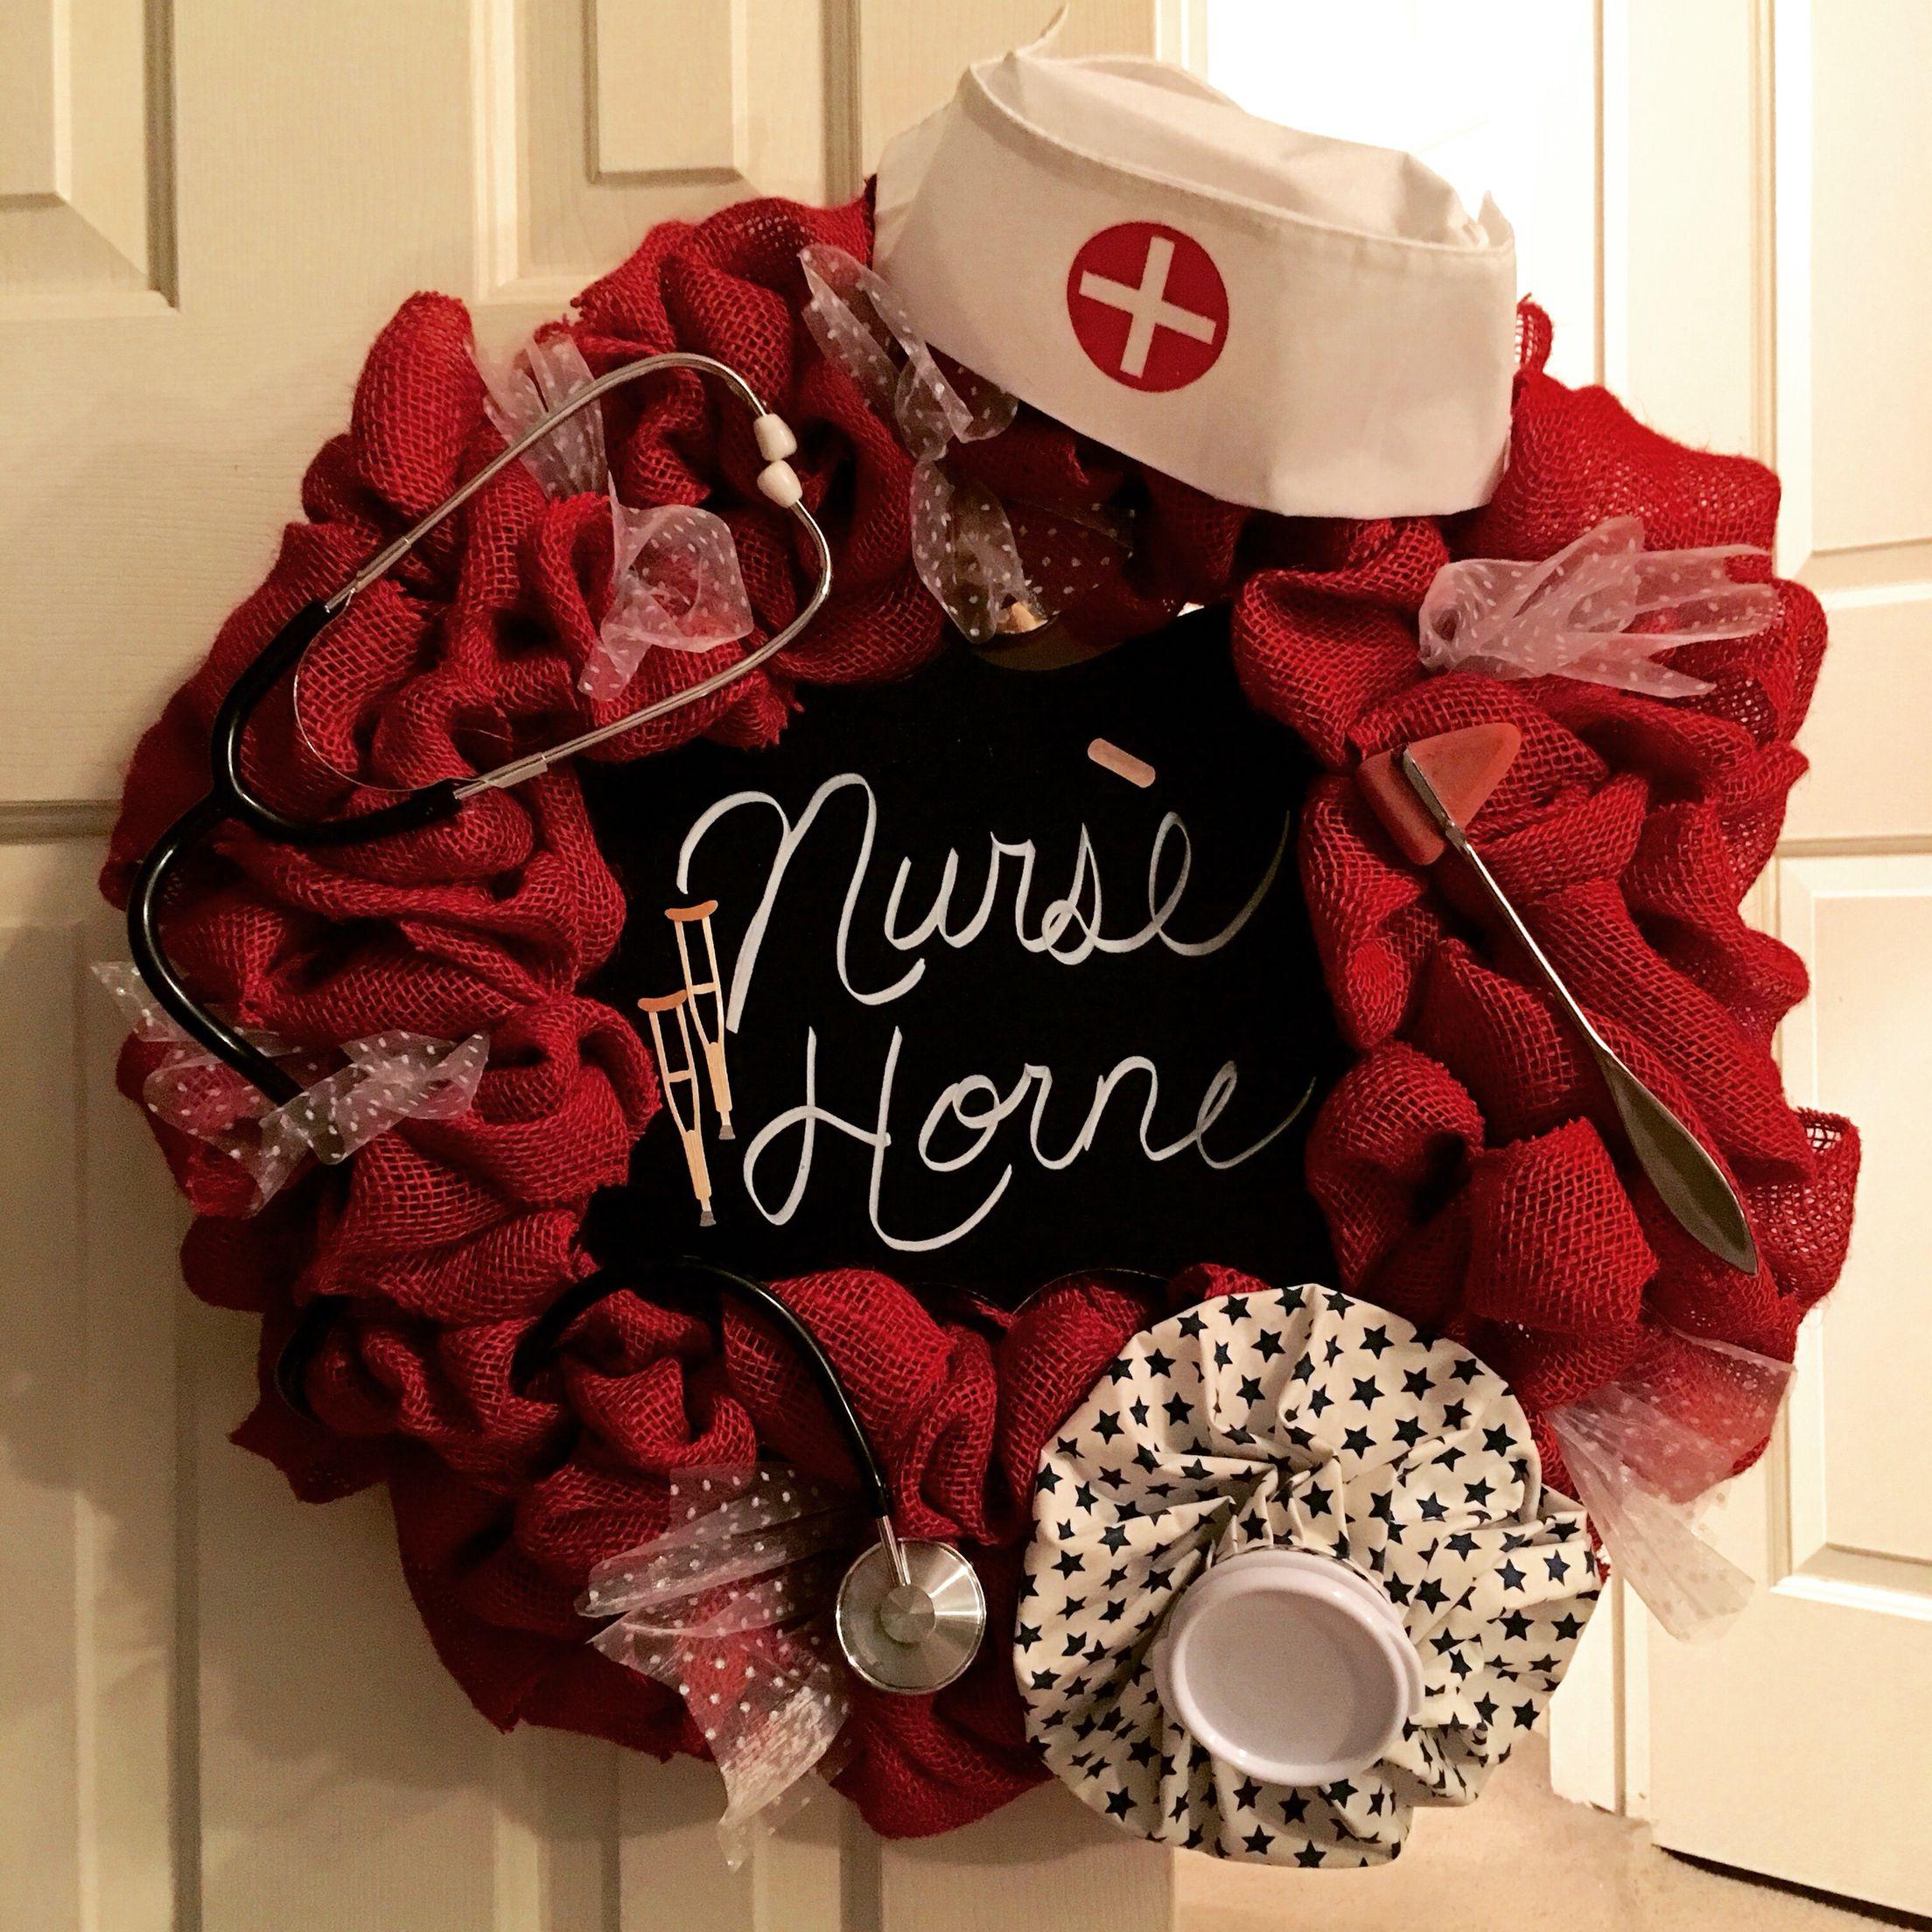 Made This For My School Nurse Wreaths Pinterest